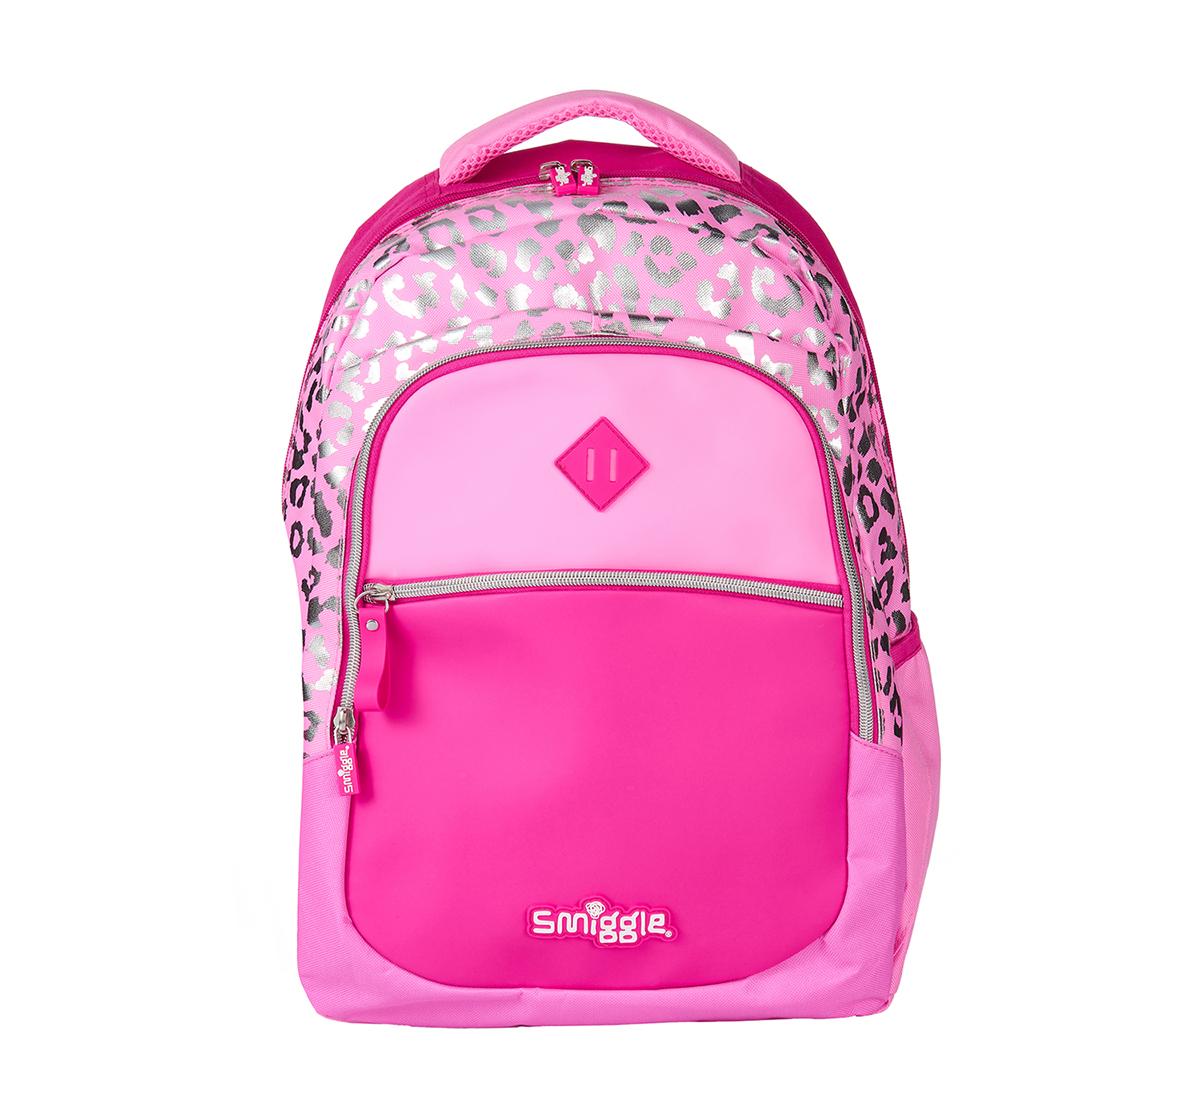 Smiggle | Smiggle Block Backpack - Leopard Print Bags for Kids age 3Y+ (Pink)